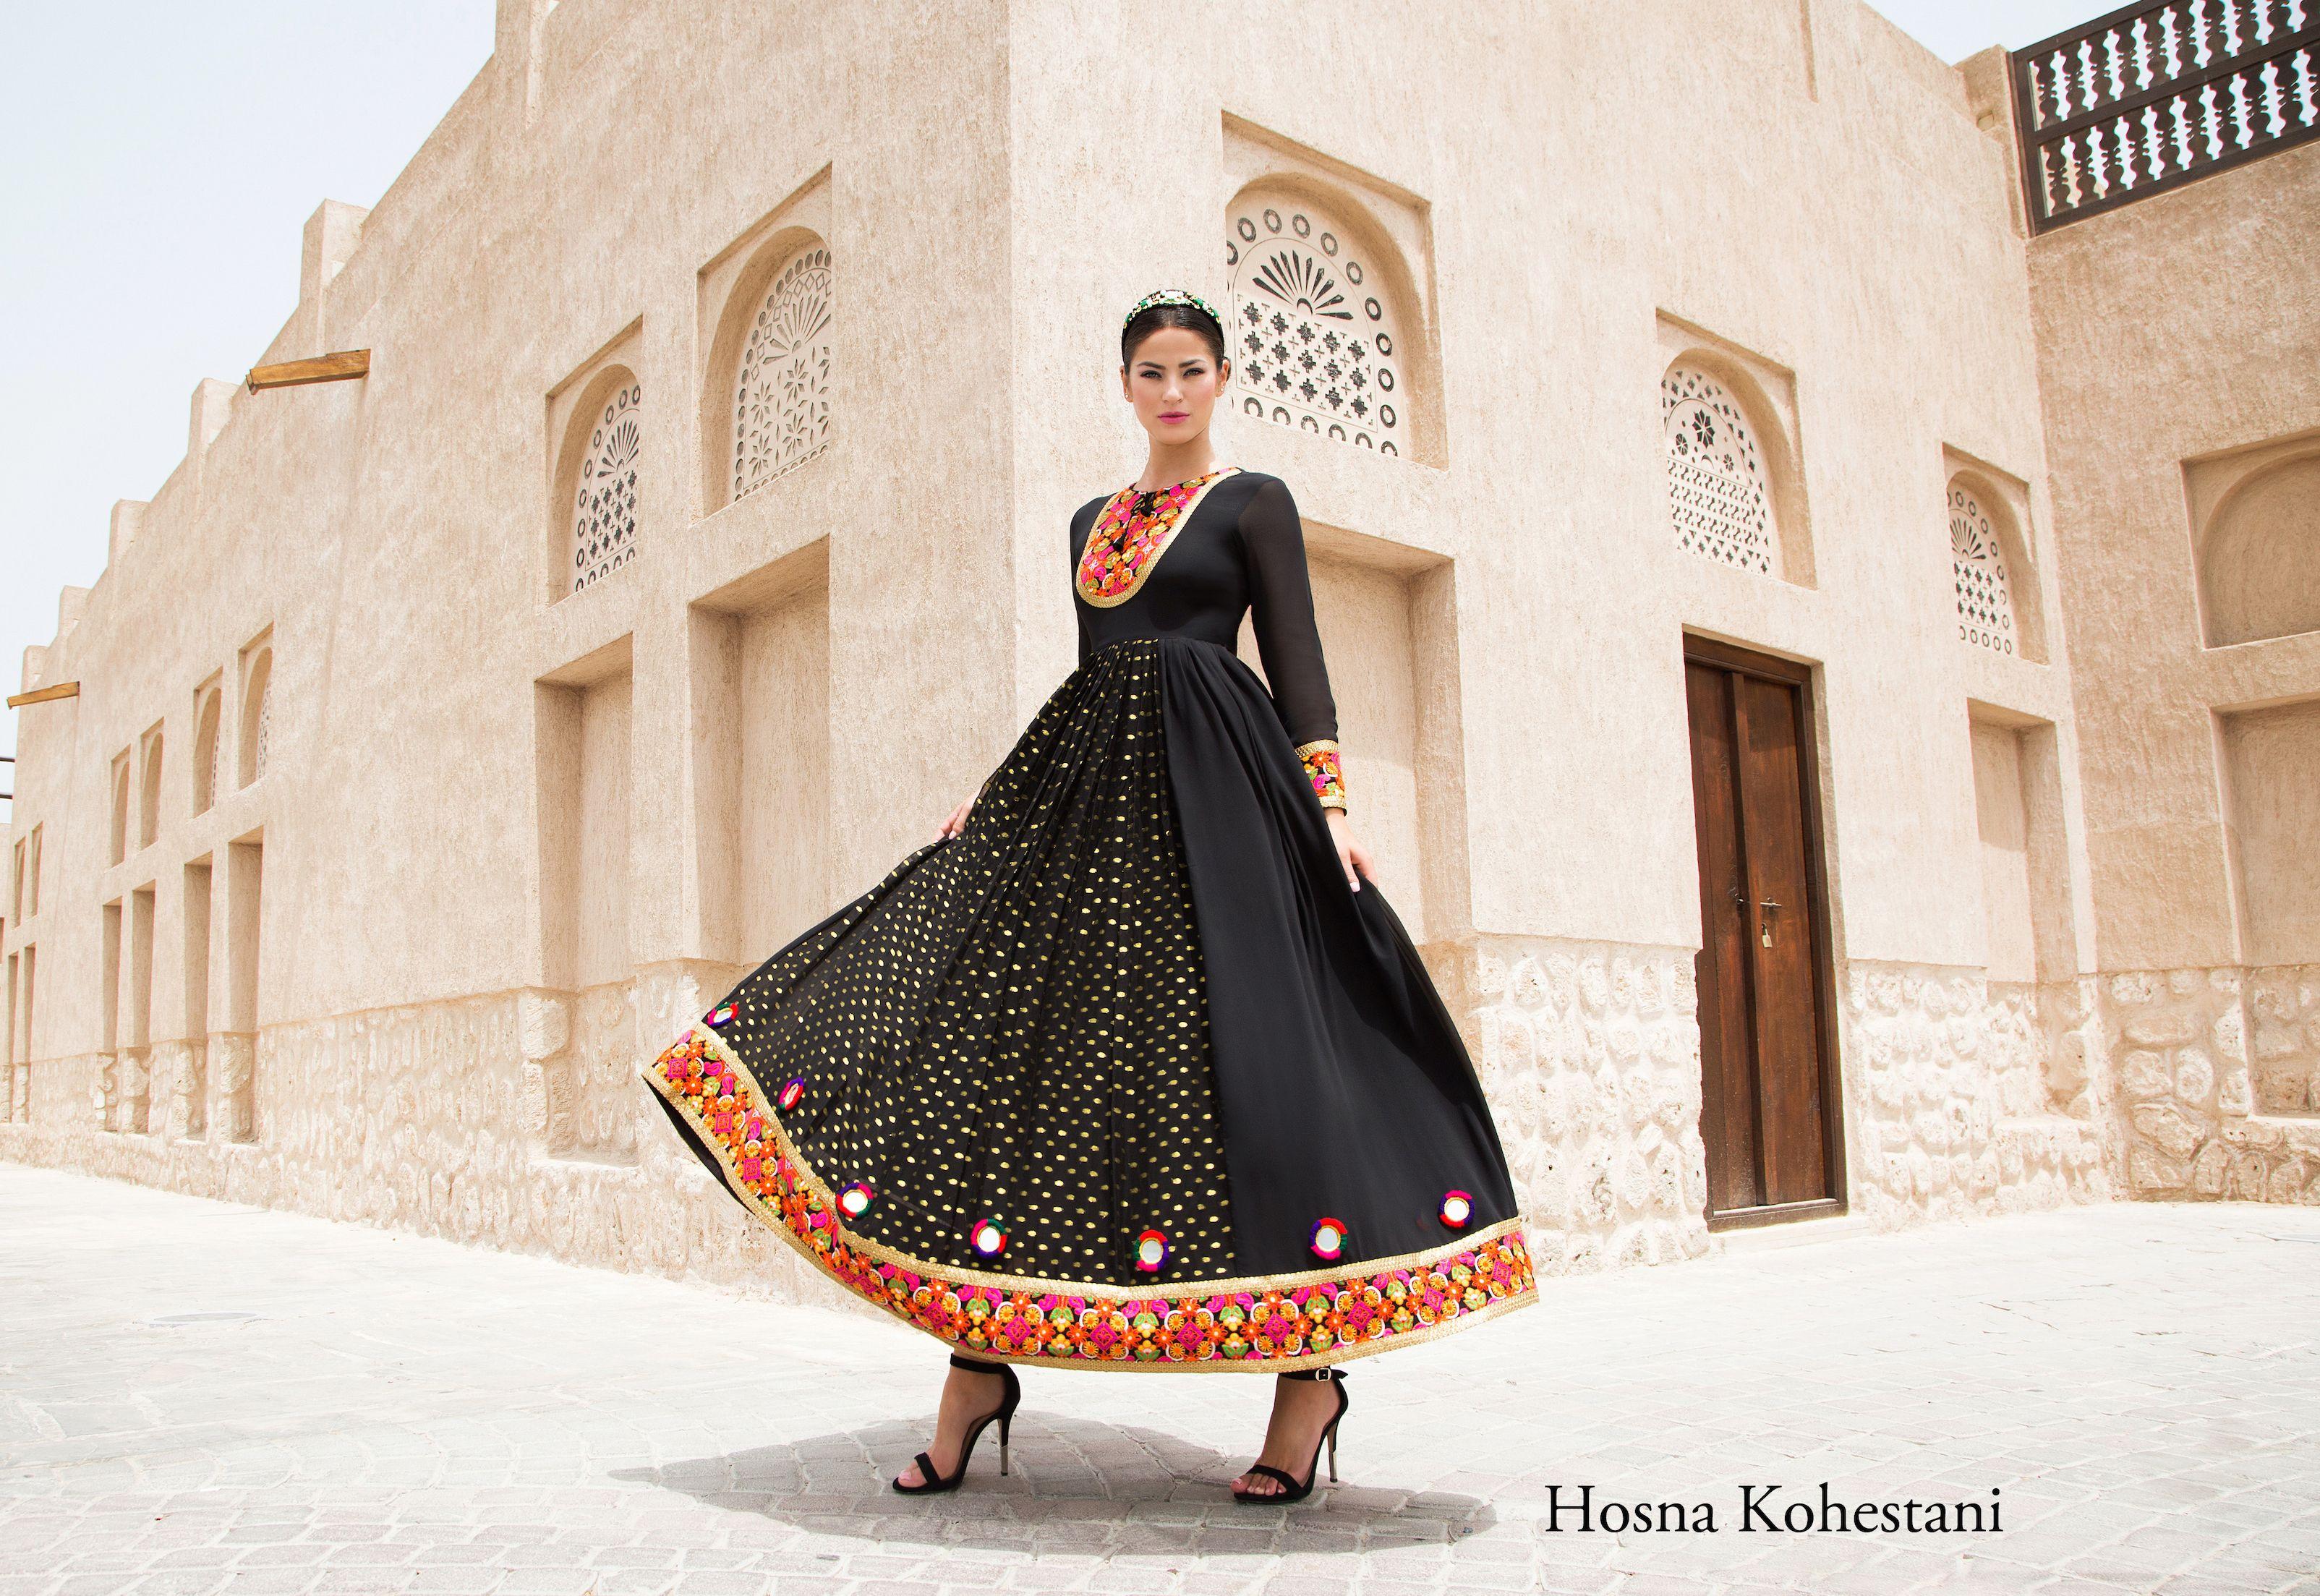 #afghan #afghandress #afghanclothes #afghangirl #afghanwoman #kabul #designer #fashiondesigner #afghanistan #afghanwedding #dress #dubai #mydubai #middleeast